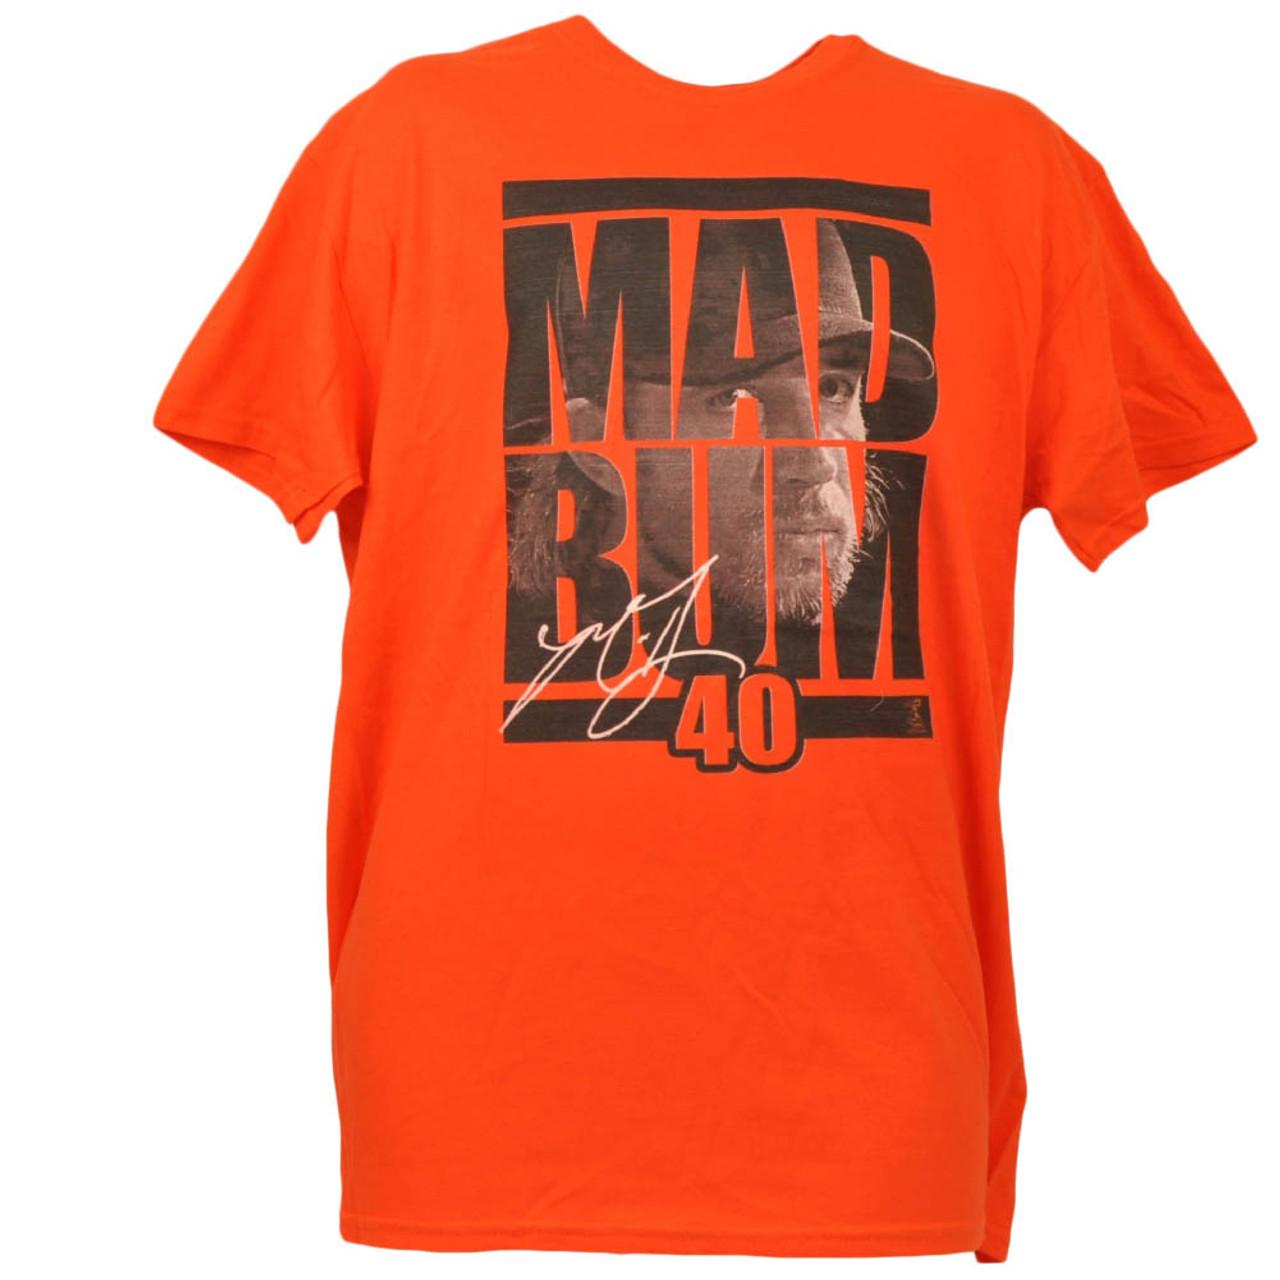 best service 54034 4db3e San Francisco Giants Mad Bum 40 Madison Bumgarner Orange Tshirt Tee Large  Mens